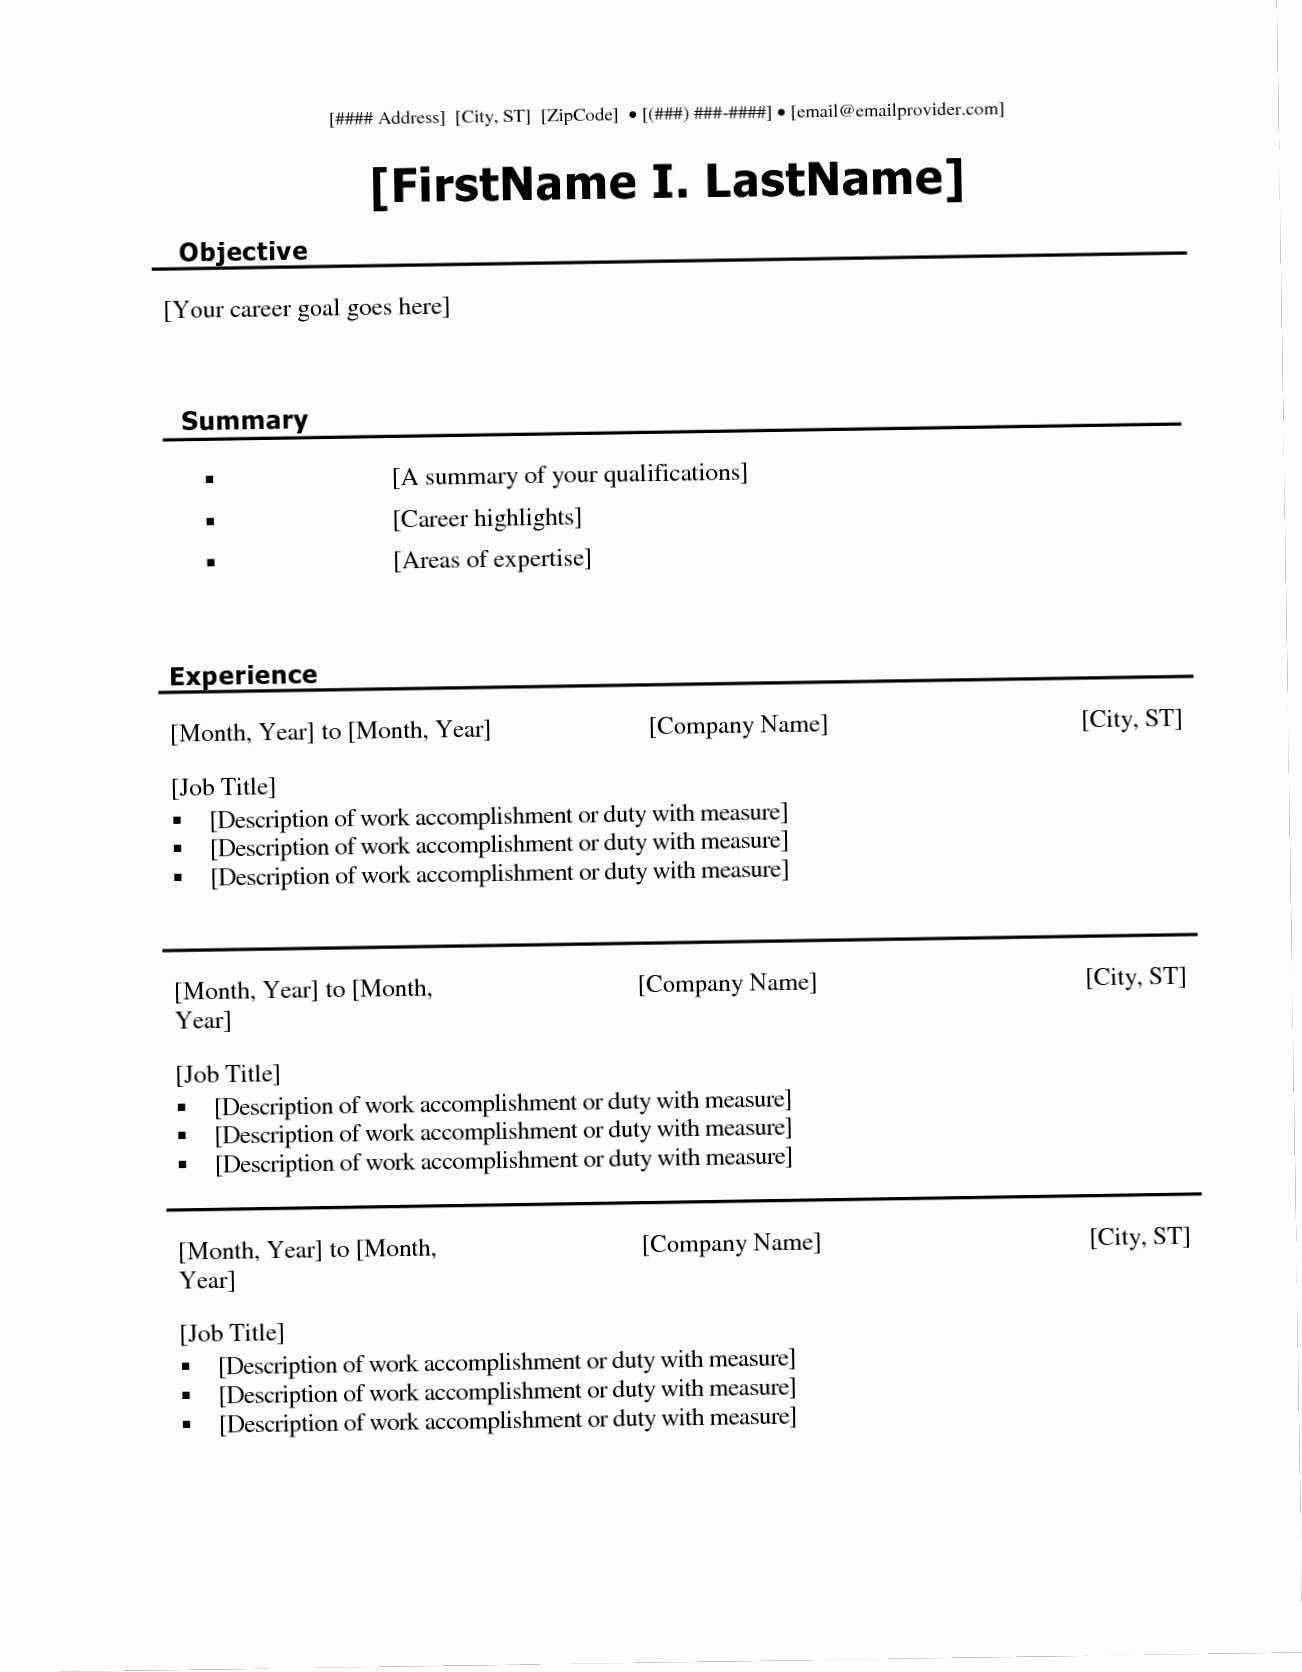 030 Student Resume Templates Microsoft Word Fill Ine For Free Blank Resume Templates For Microsoft Word